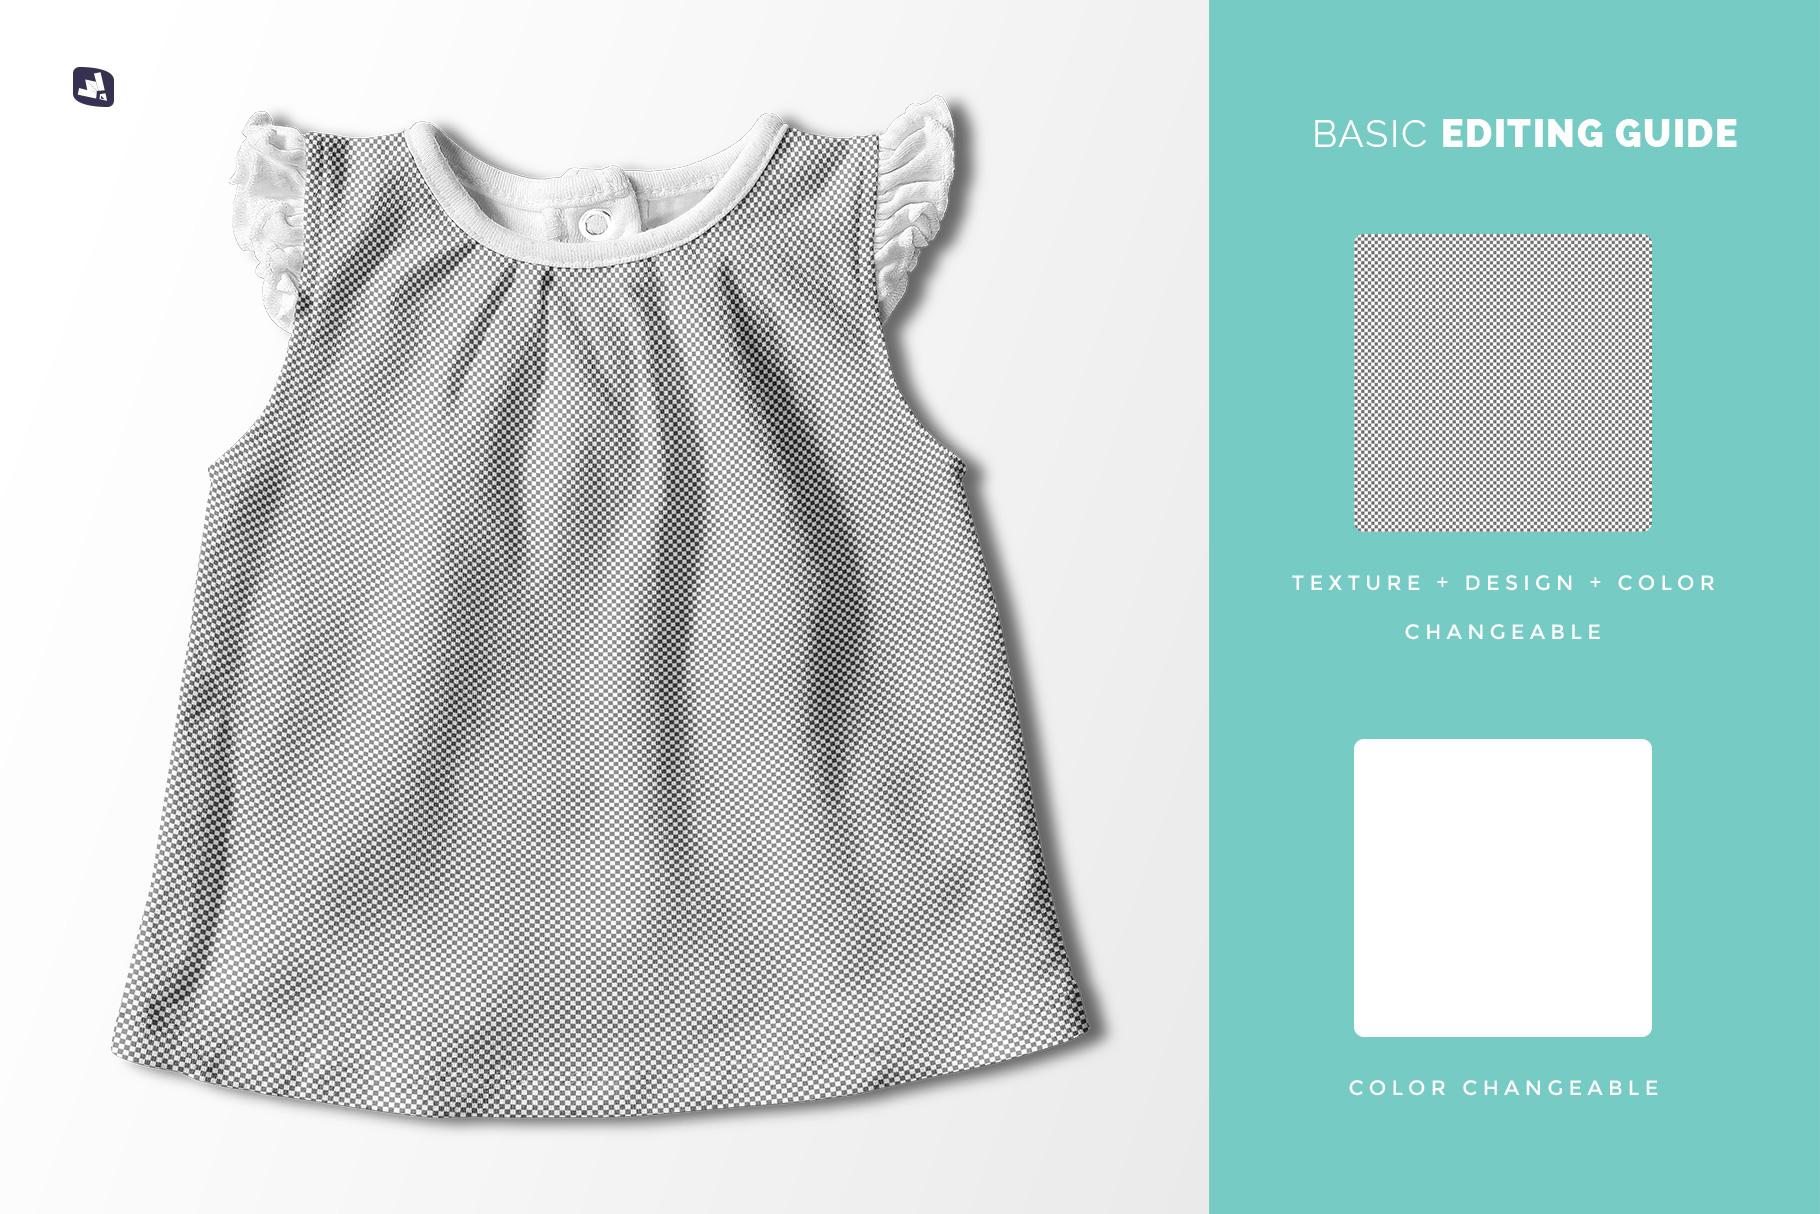 editability of the ruffle sleeve baby girl top mockup